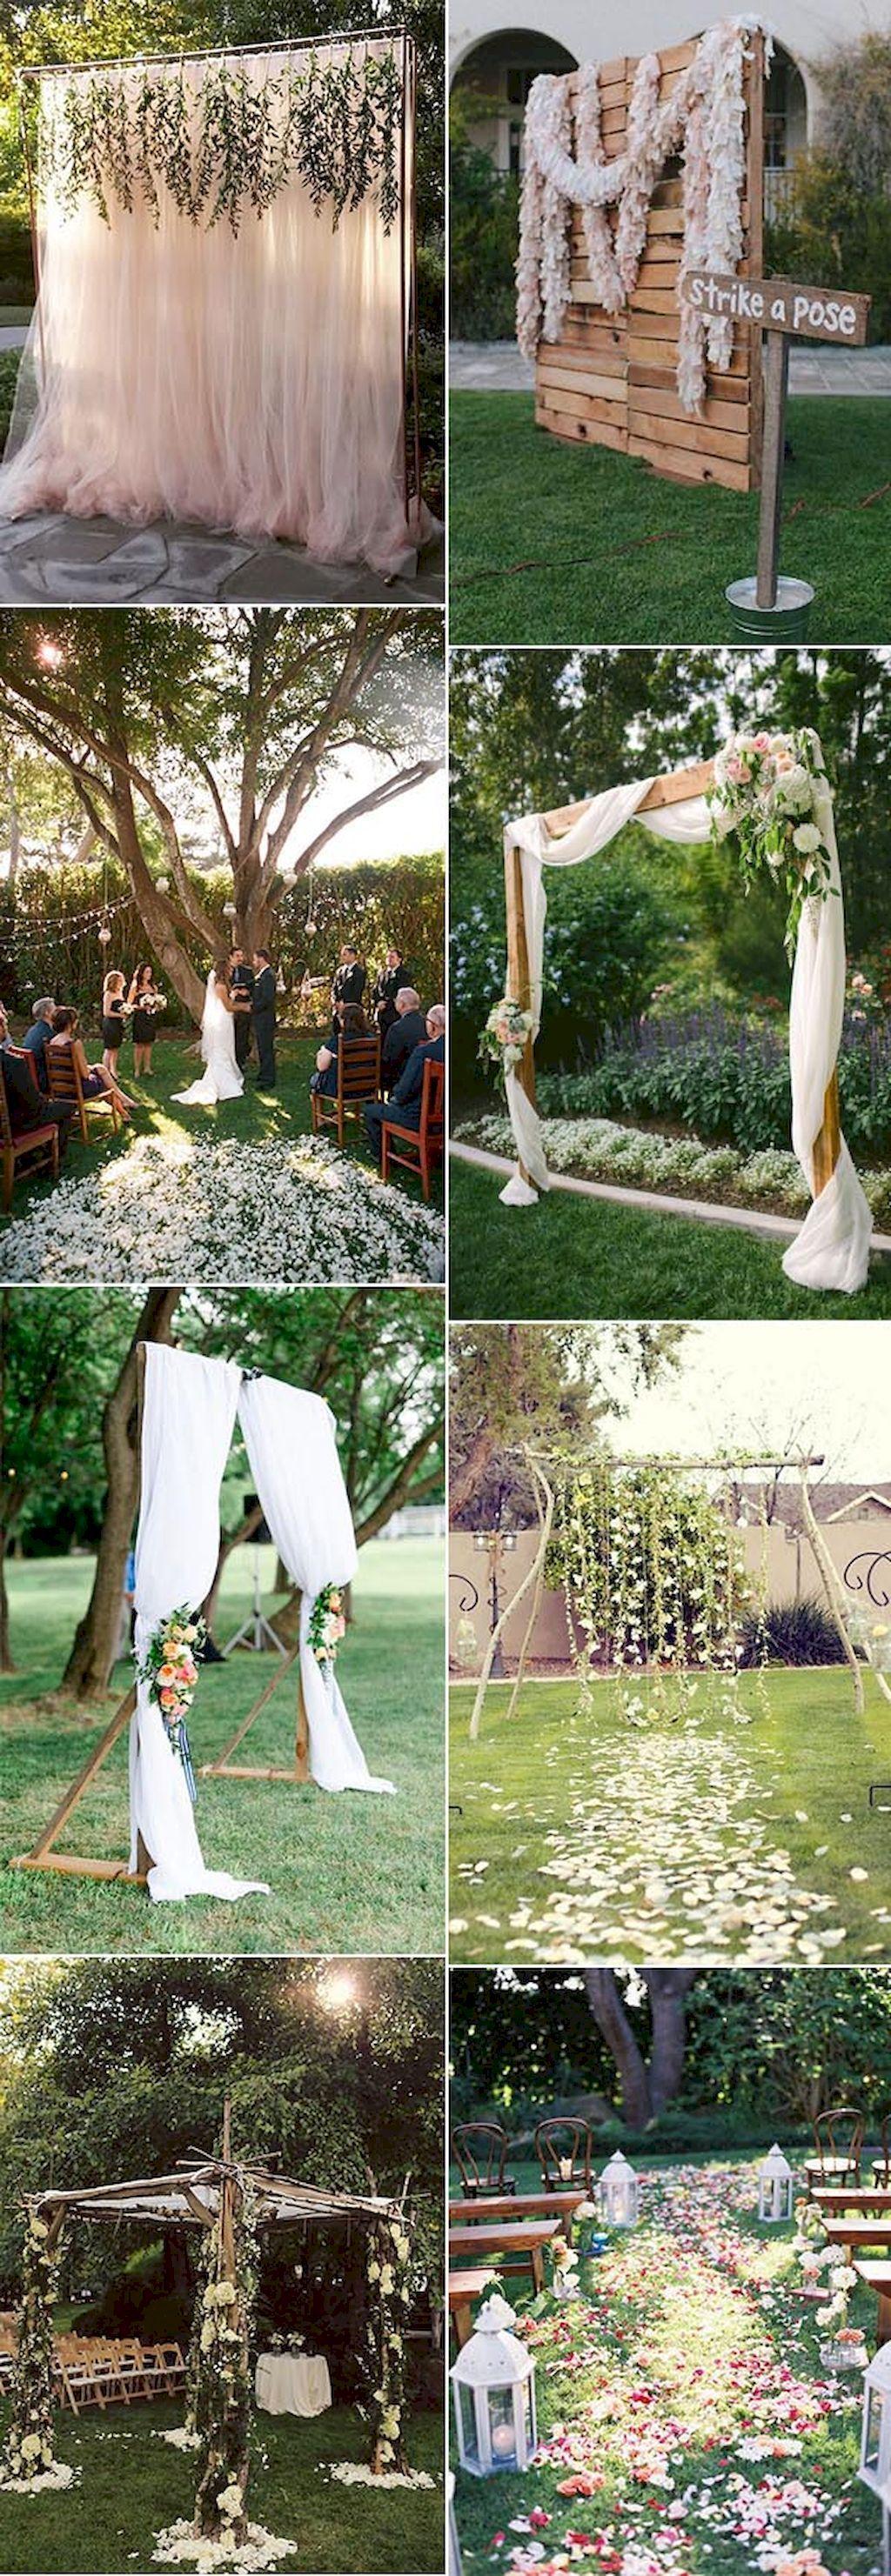 56 inexpensive backyard wedding decor ideas backyard weddings 56 inexpensive backyard wedding decor ideas junglespirit Choice Image